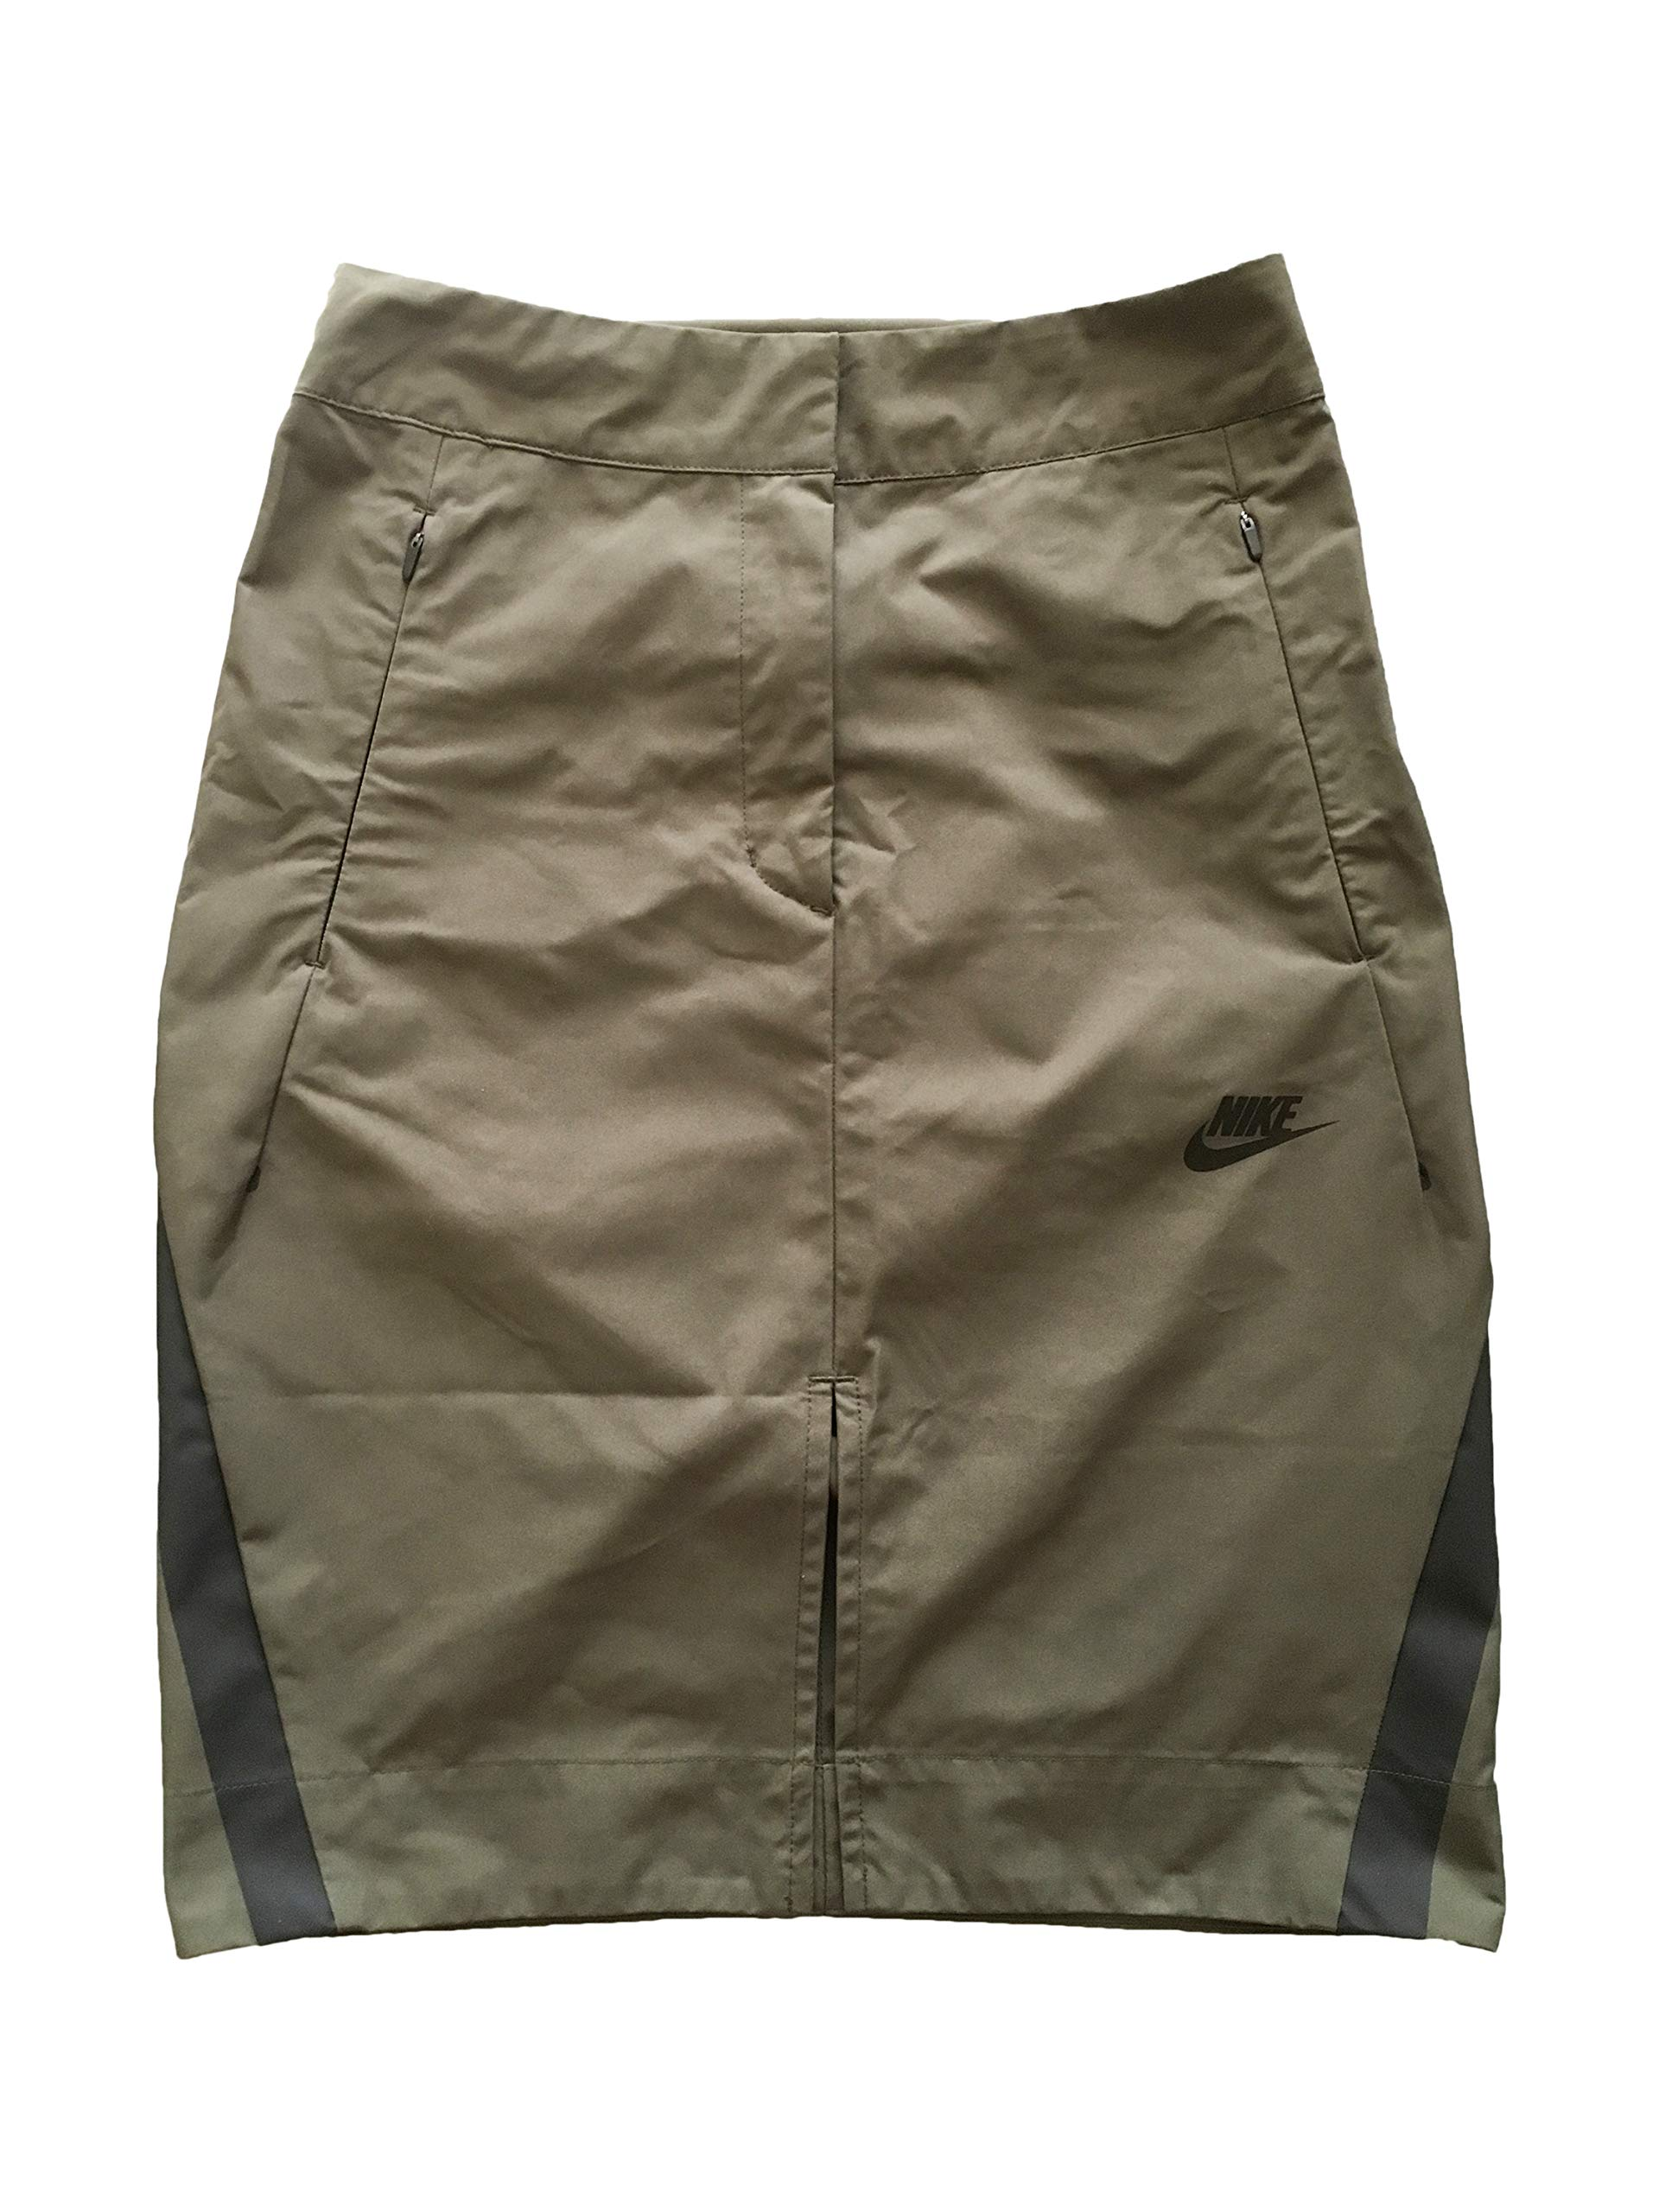 NIKE Women's Skirts Sports Skirt (XS, Khaki)